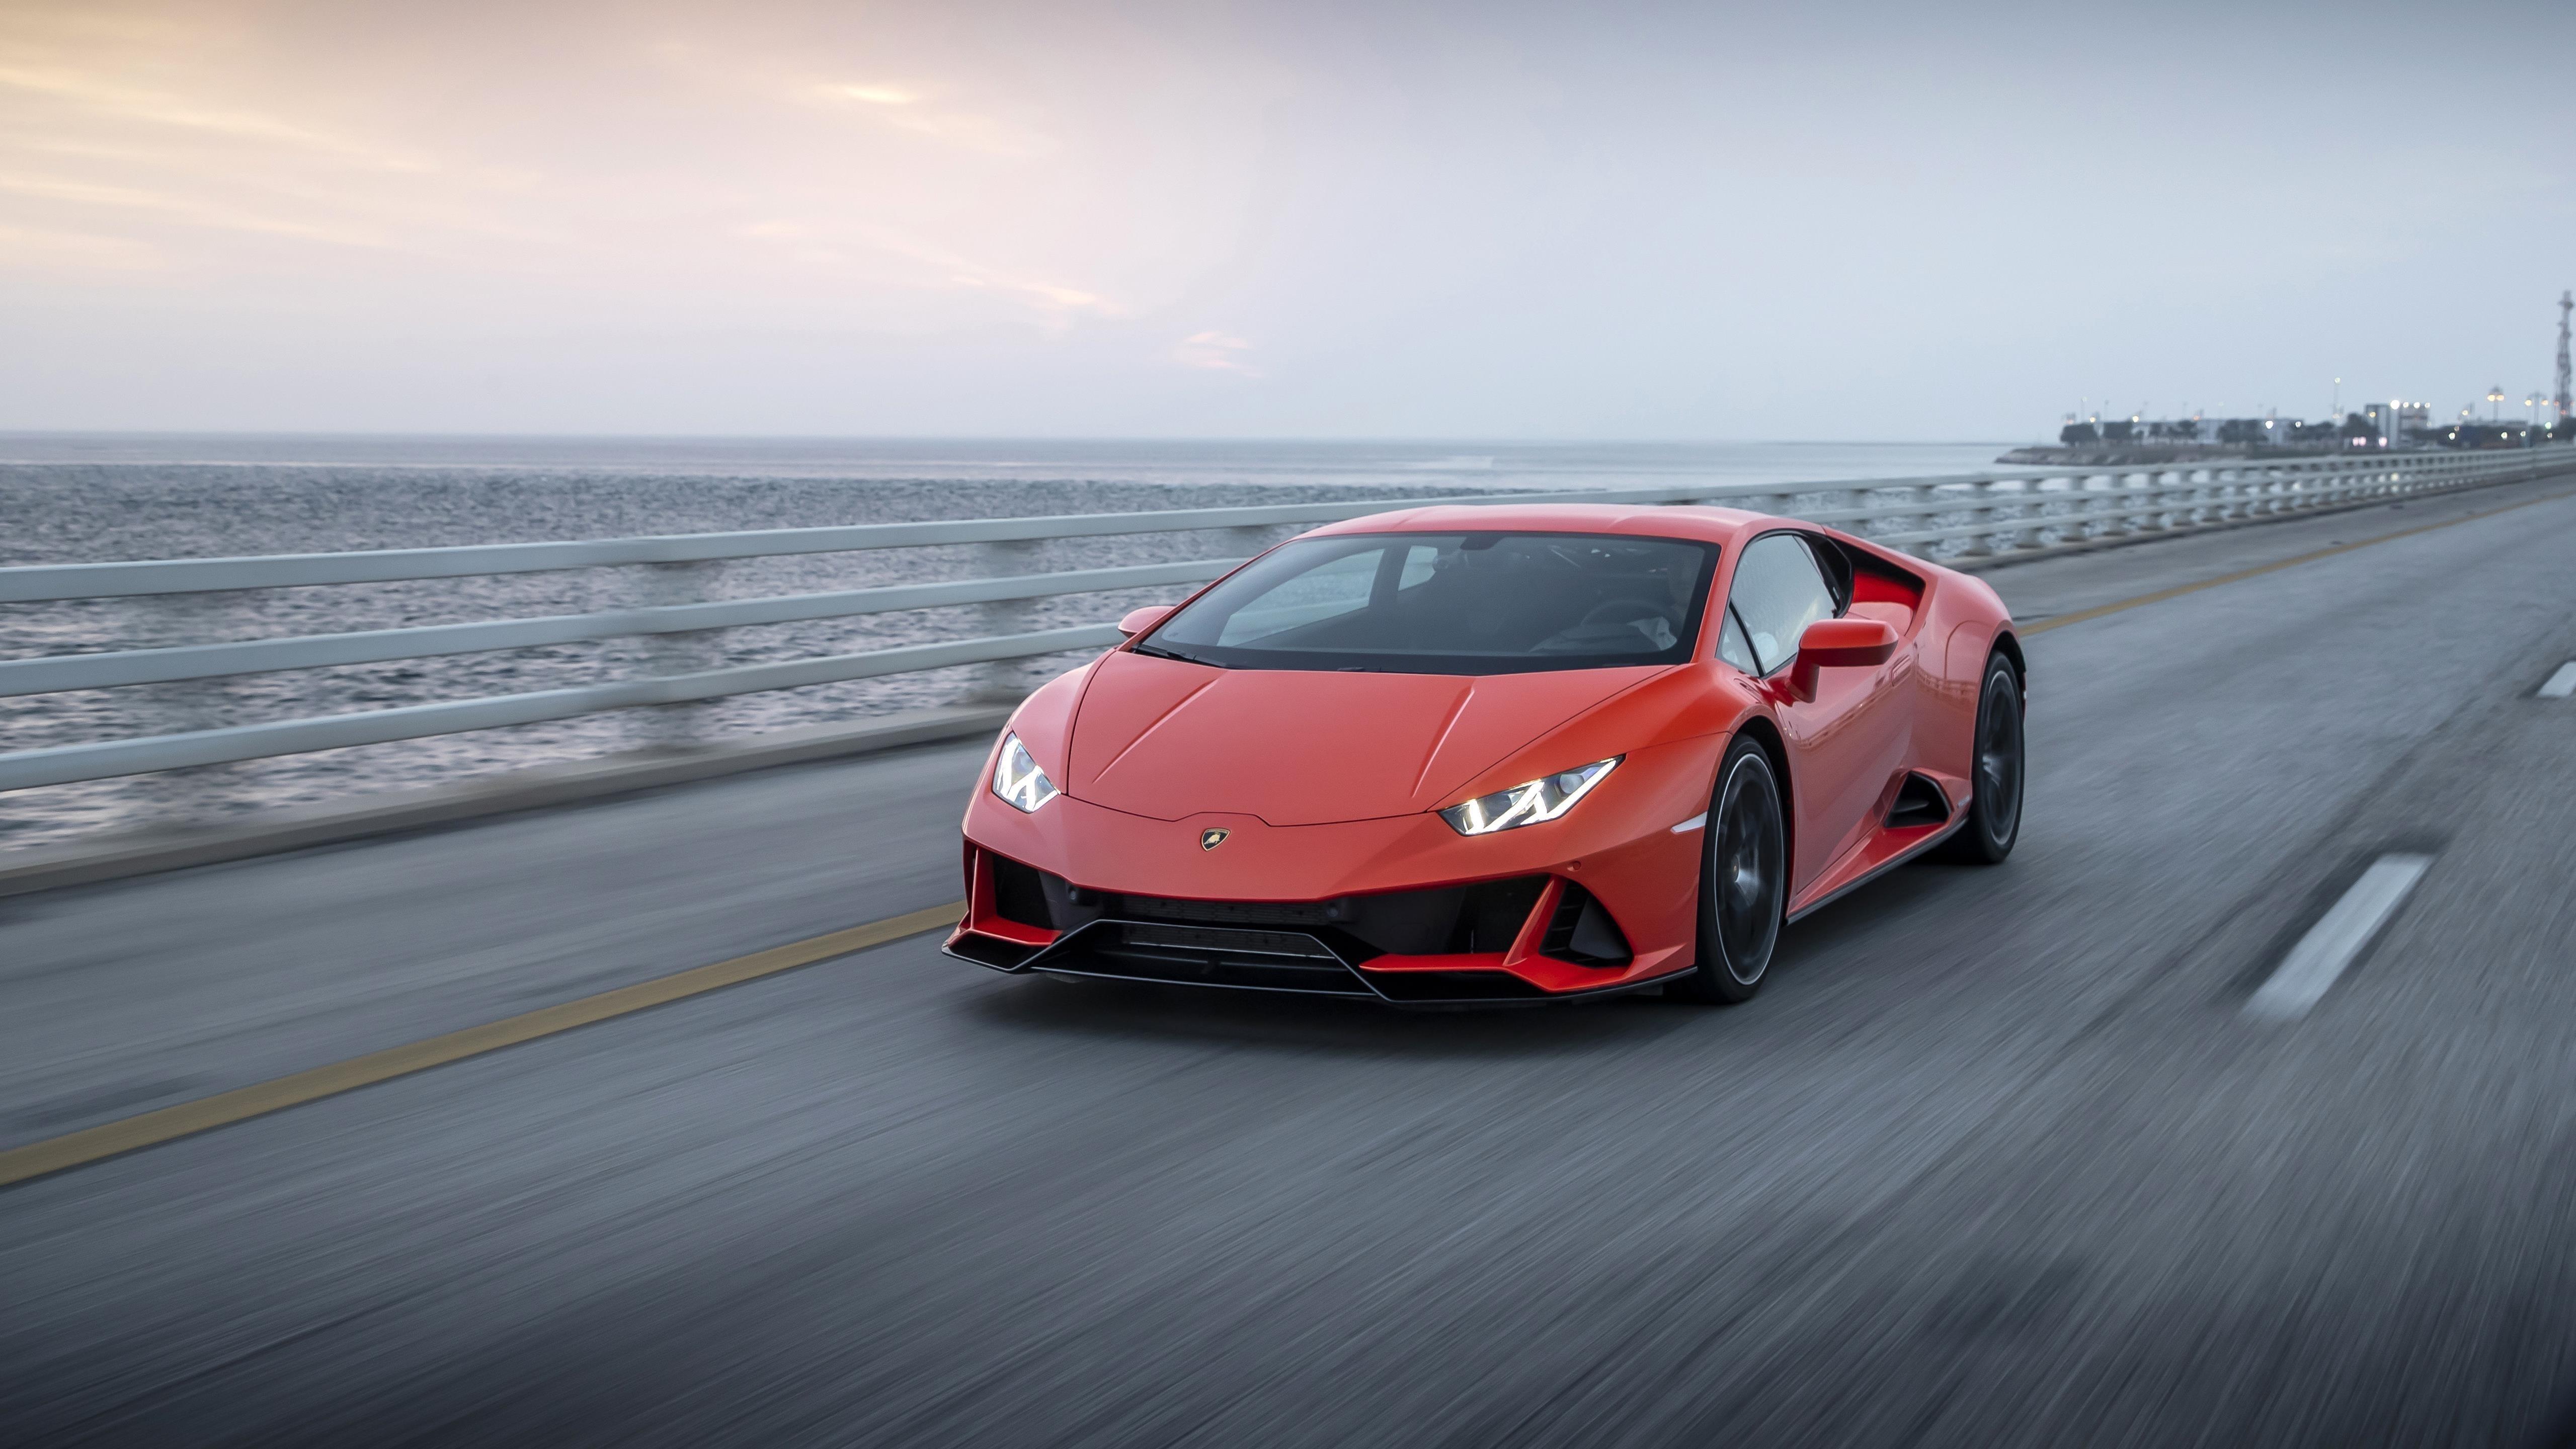 Lamborghini huracan evo 2021 2 автомобиля обои скачать